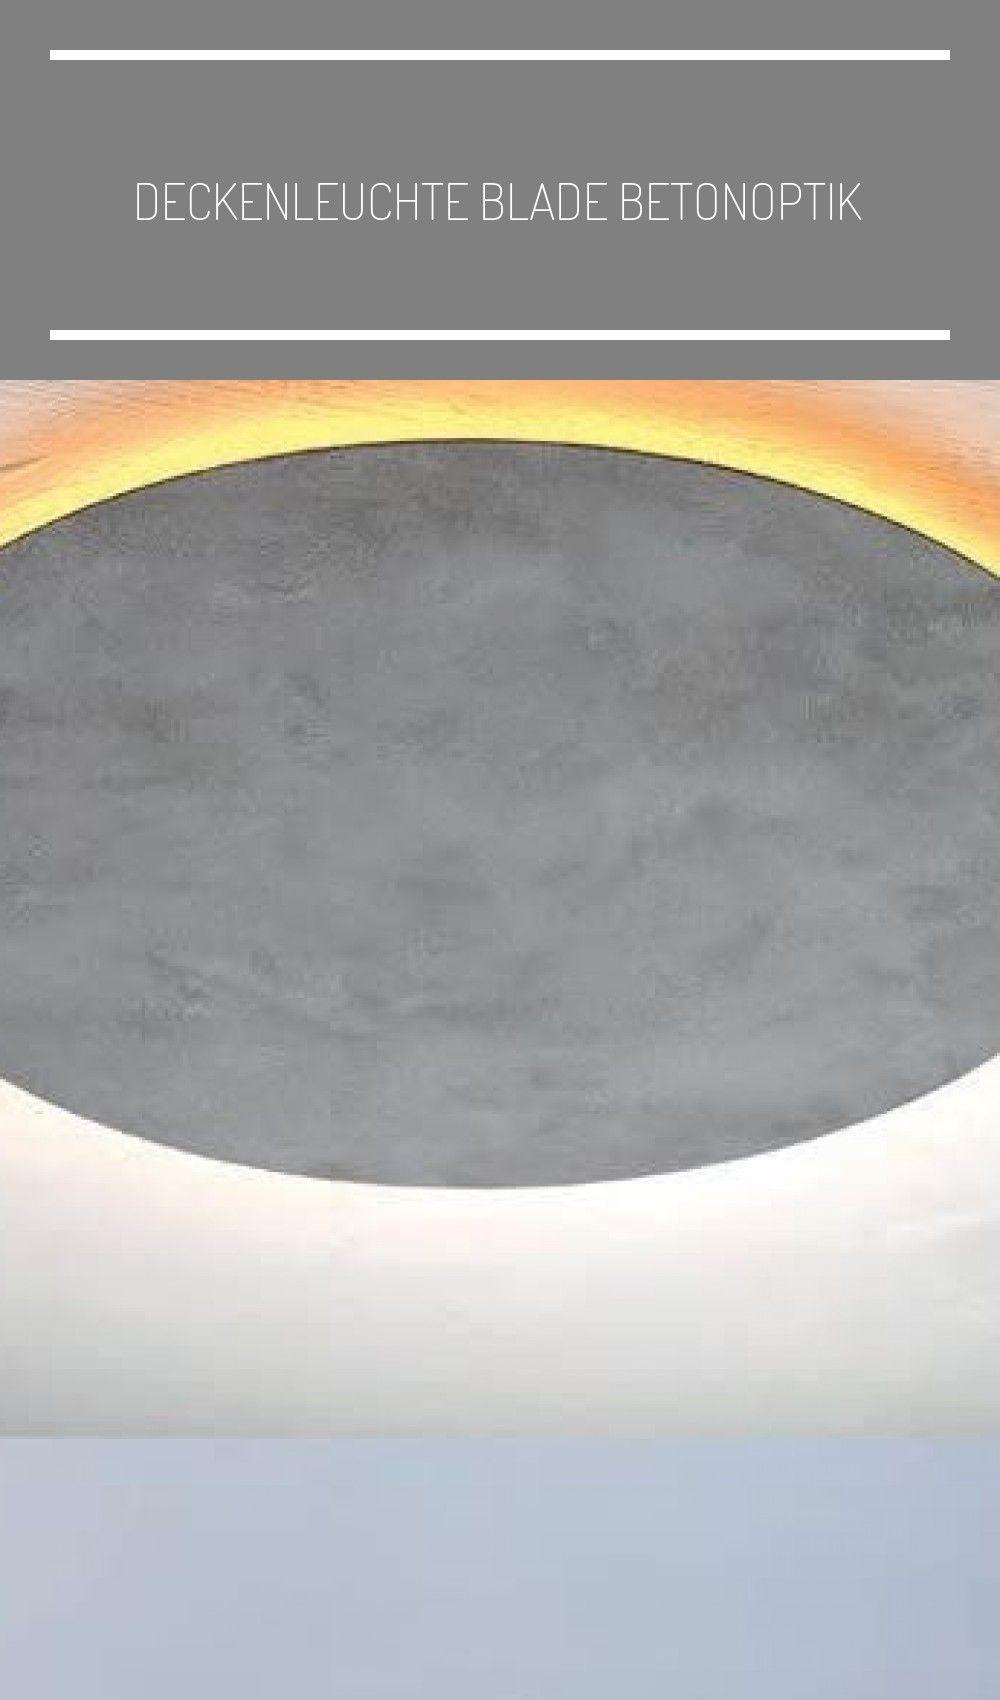 Blade Beton LED-Band 9 Kelvin (warmweiß) Deckenlampe